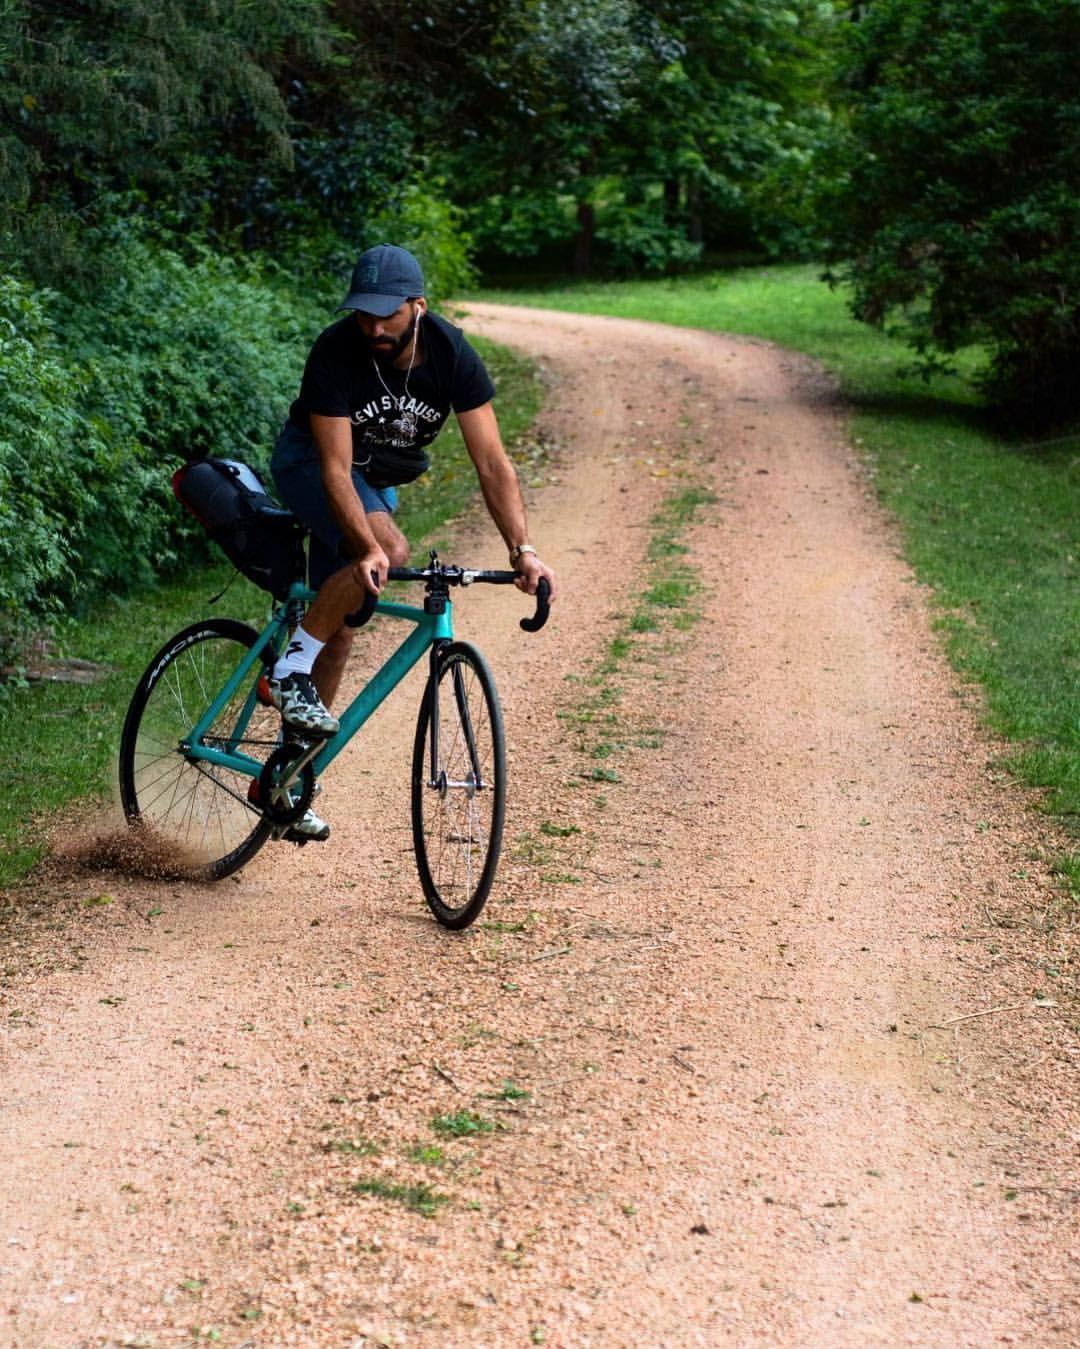 Miniskid Fixedgear Bikepacking Long Trips Touring